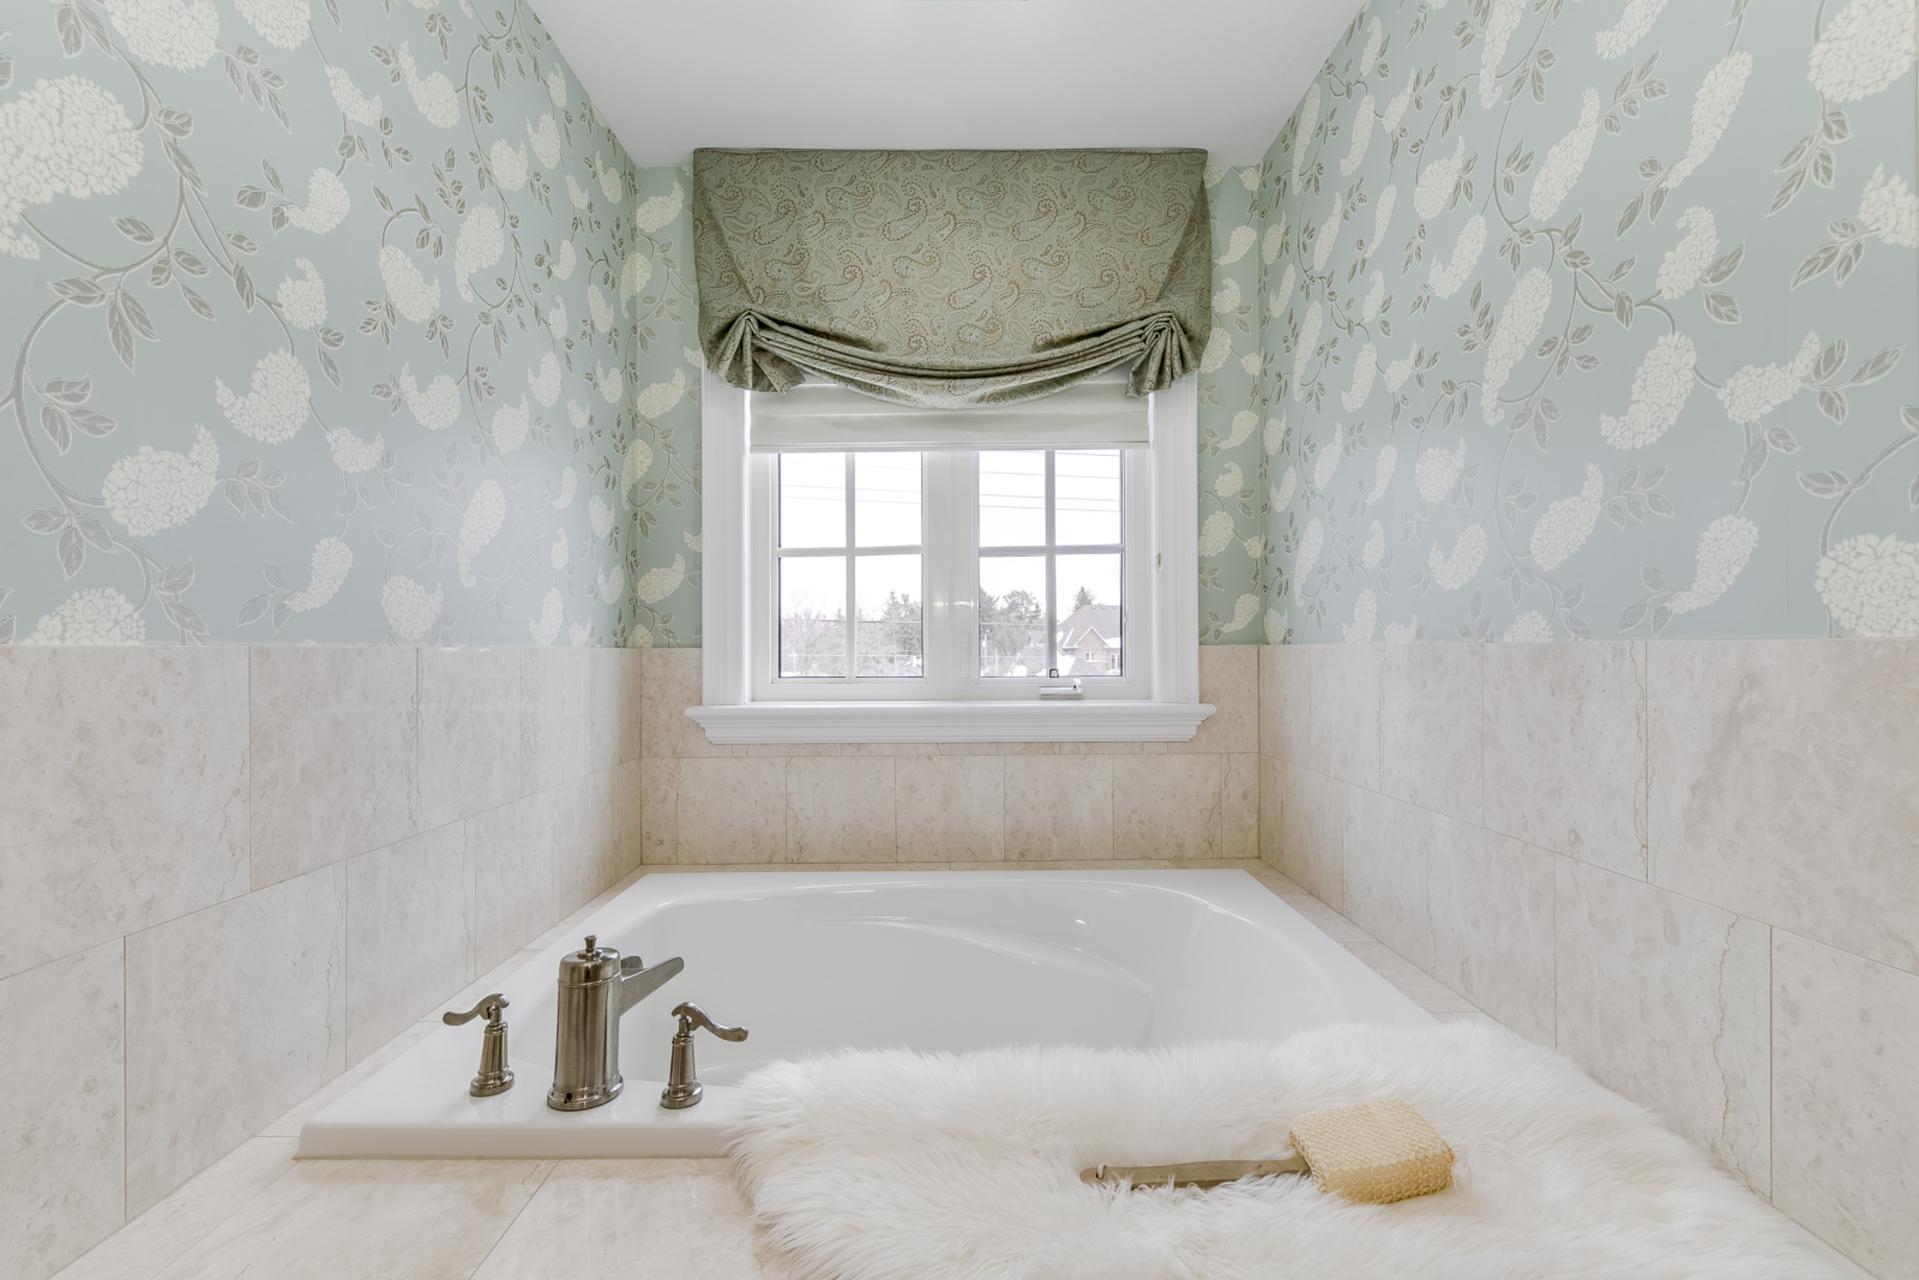 2nd Bedroom Ensuite - 725 Queensway W, Mississauga - Elite3 & Team at 725 Queensway West, Erindale, Mississauga